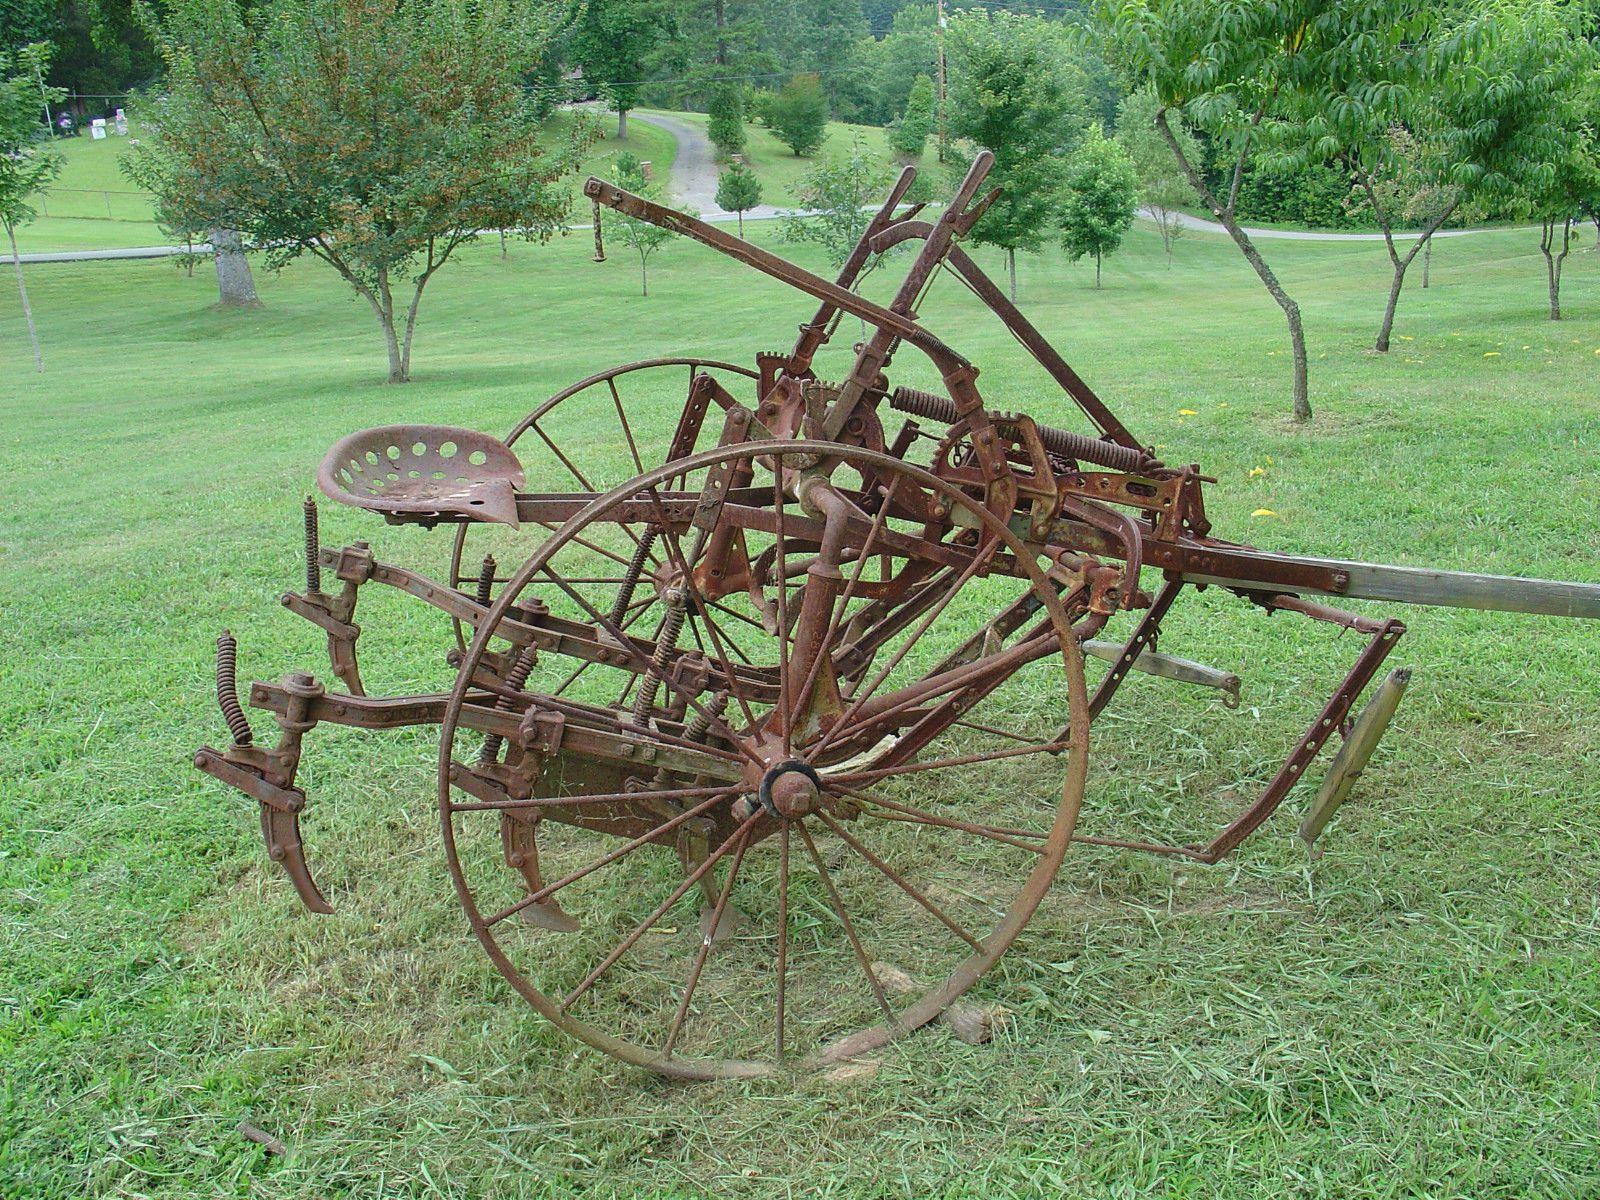 Antique farm equipment horse drawn riding cultivator